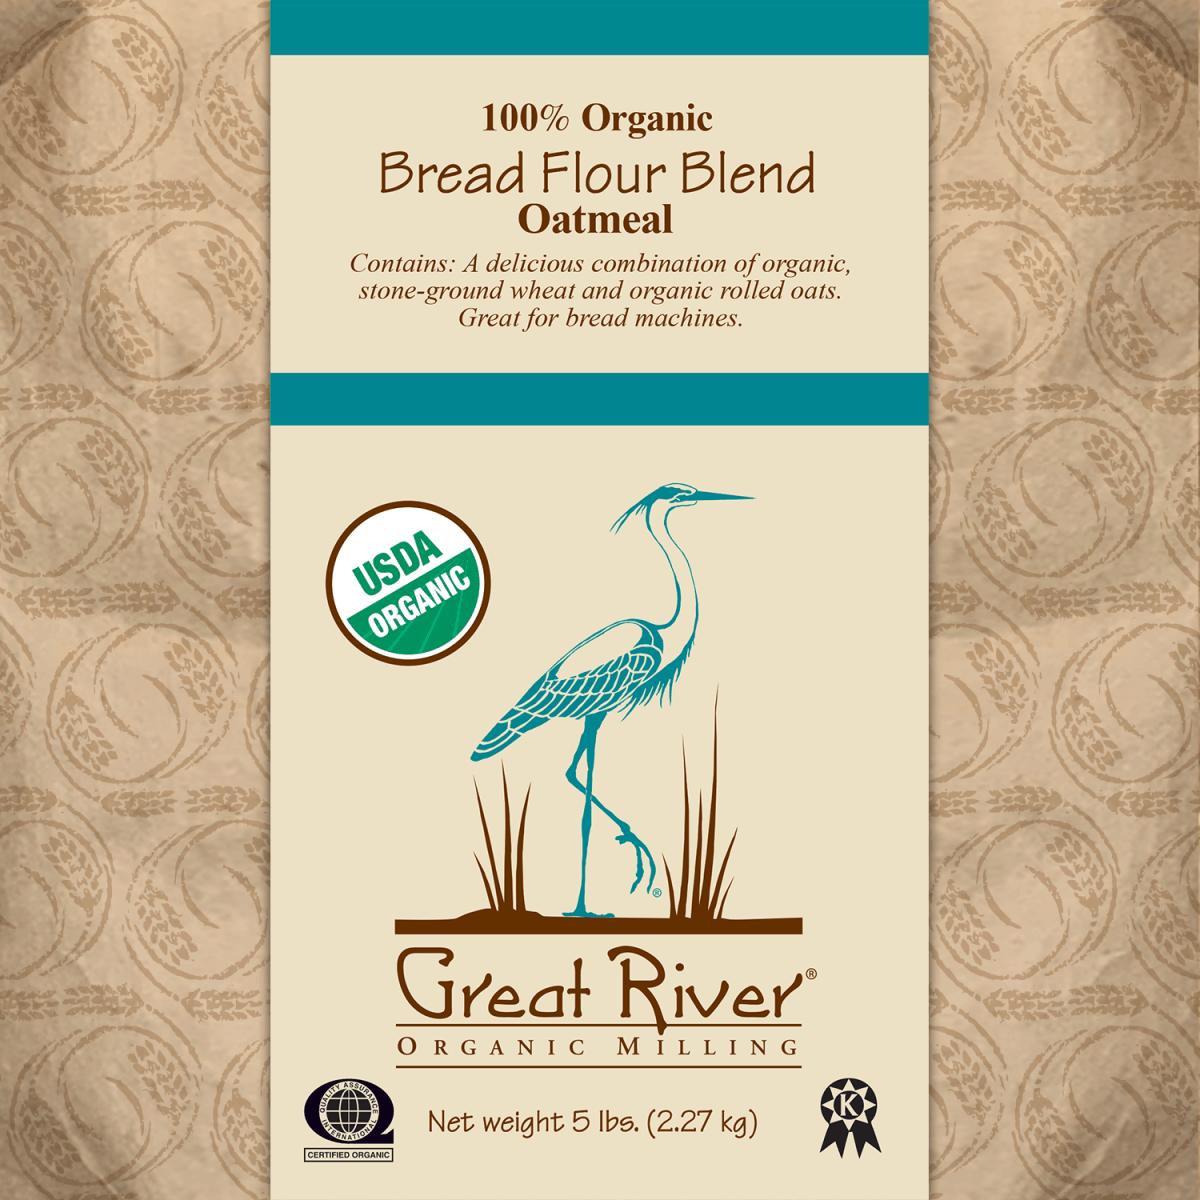 BreadFlourBlend_Oatmeal_Front